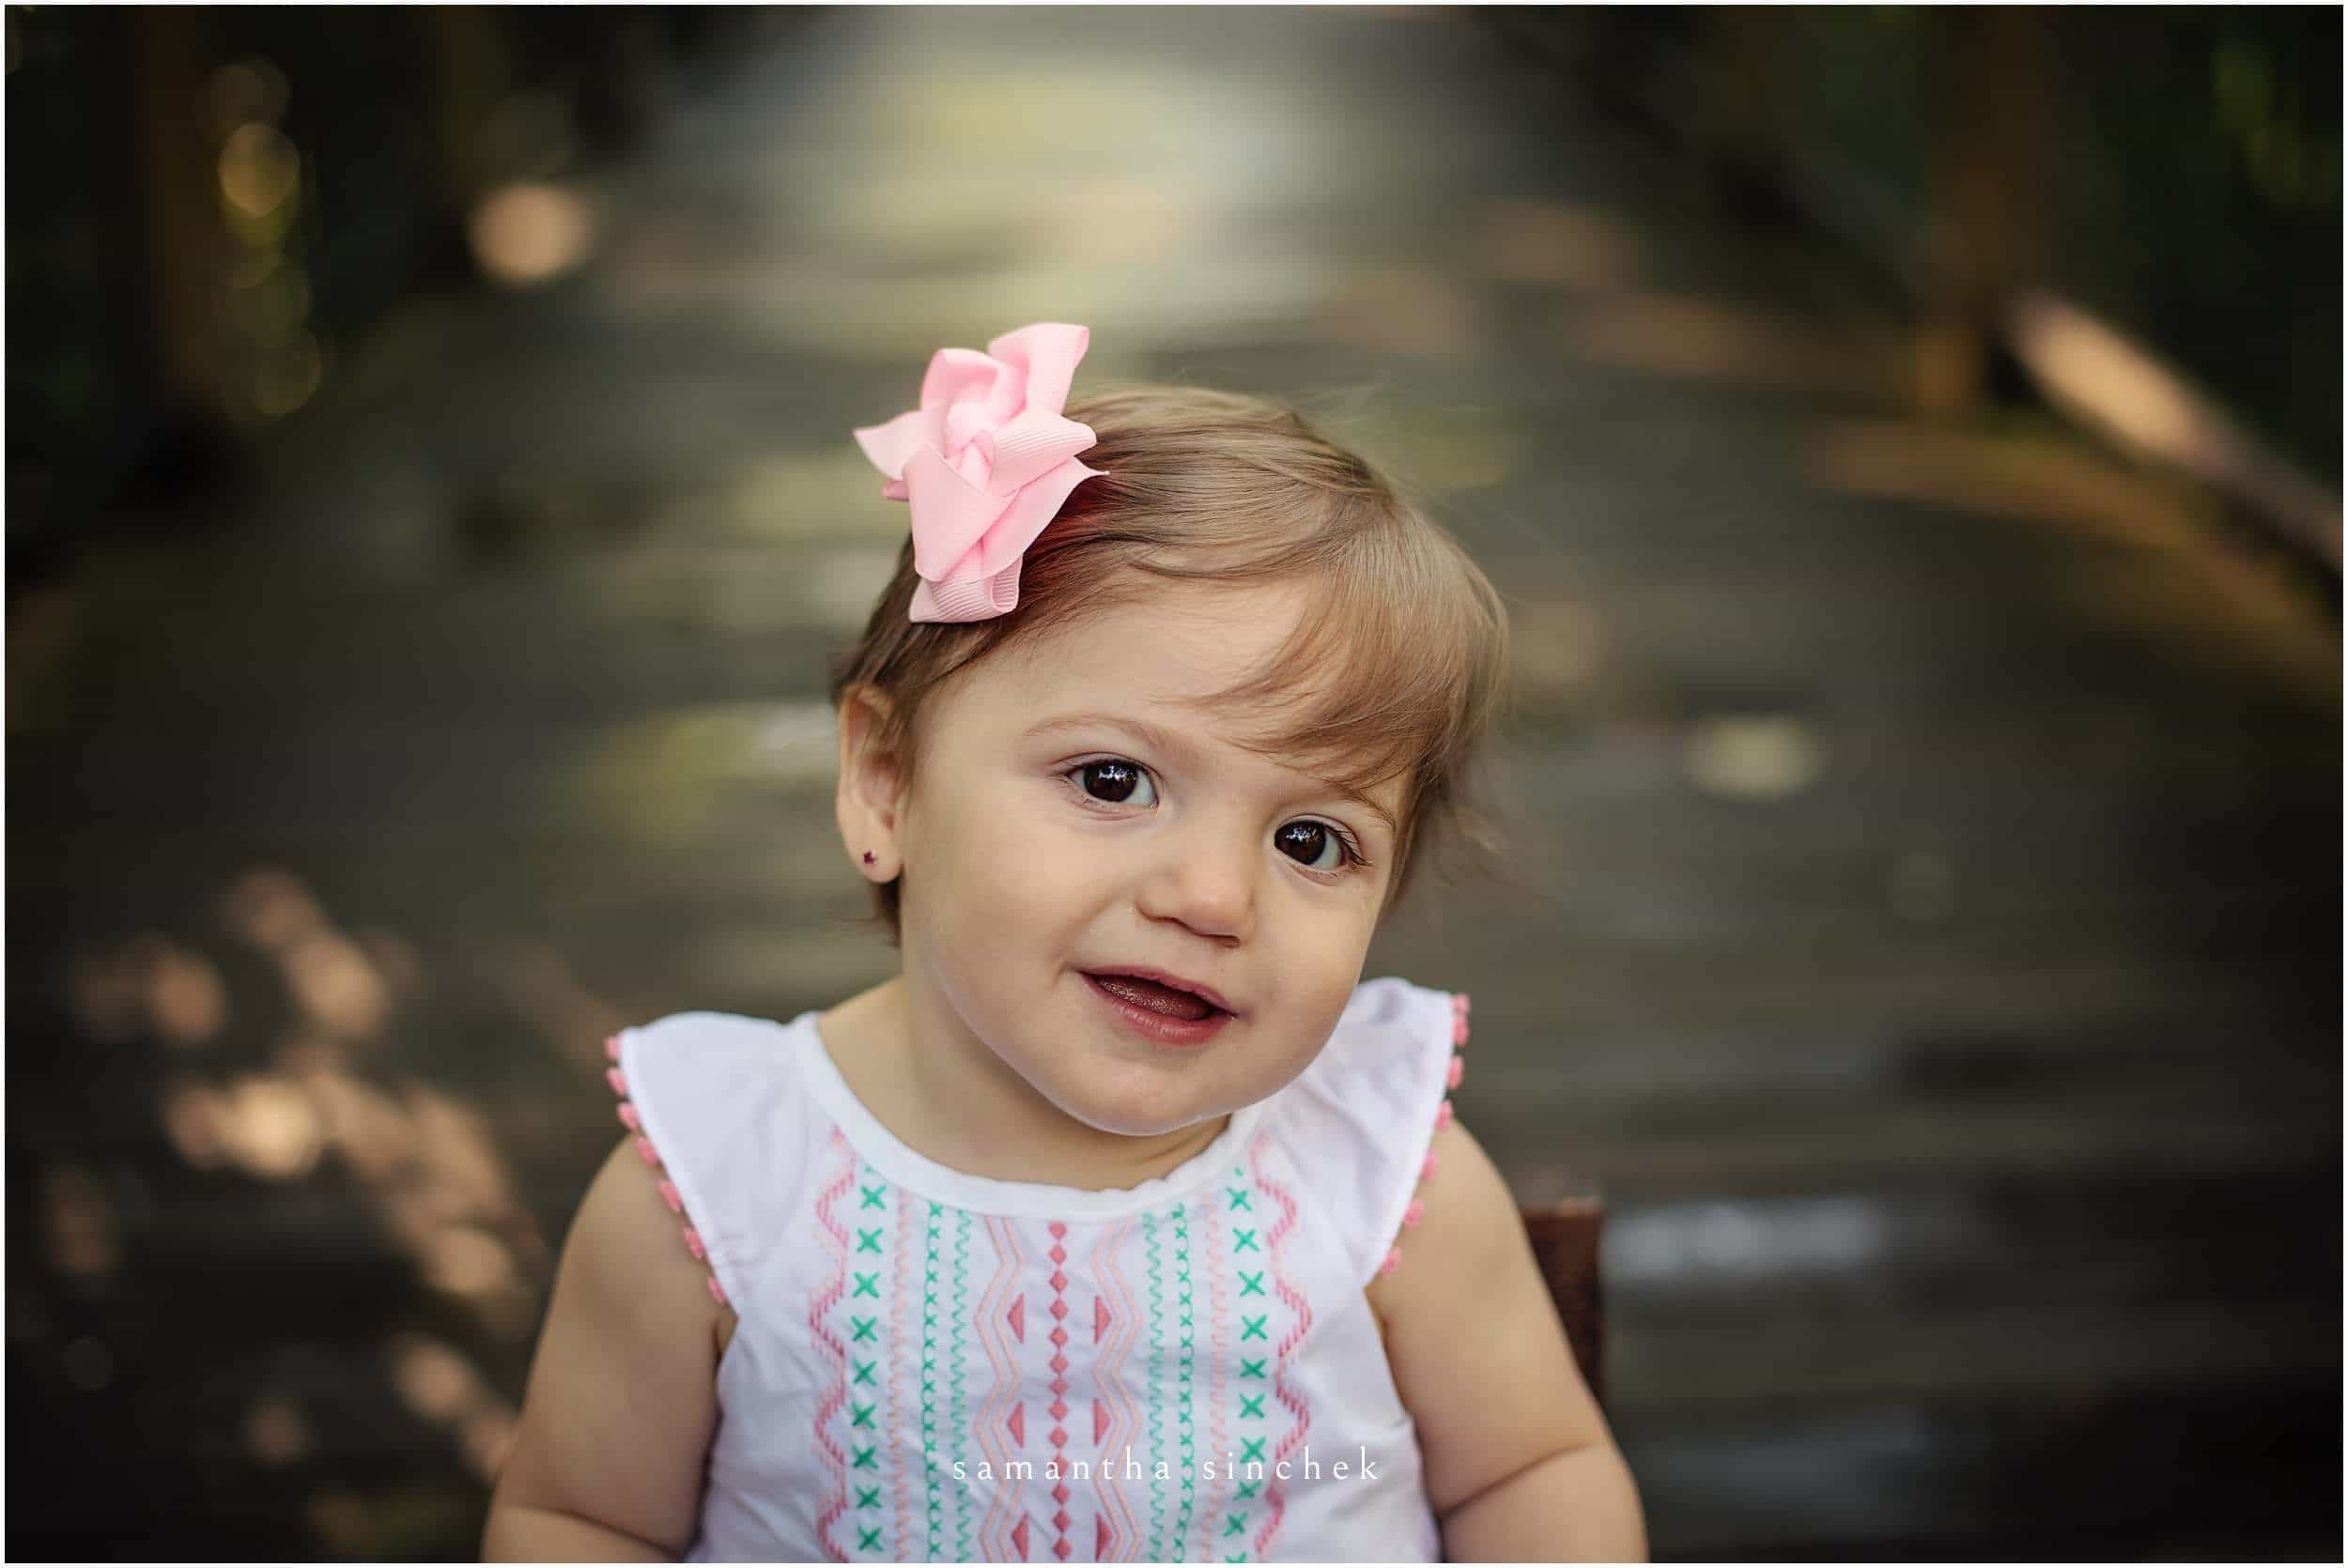 one year old girl cake smash at sharon woods with cincinnati photographer Samantha Sinchek